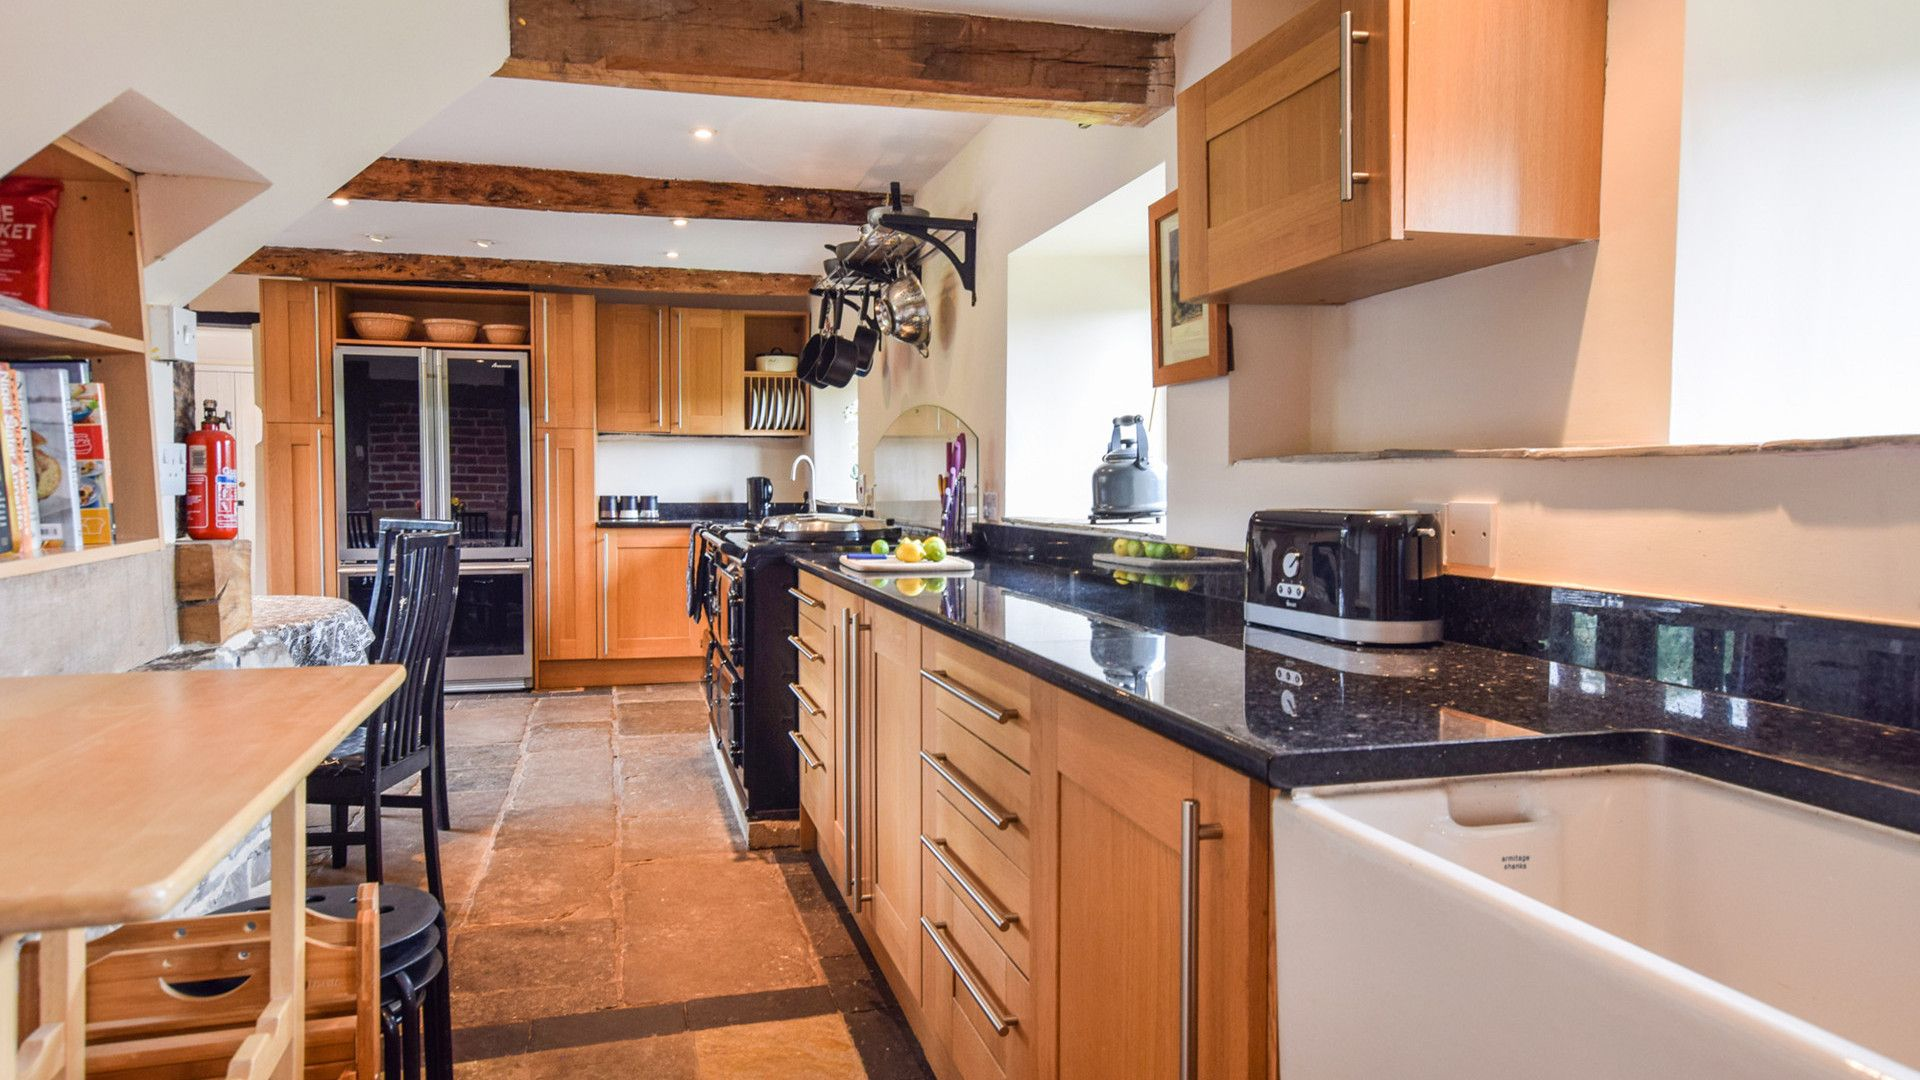 Kitchen with Aga, Cyder Press House, Bolthole Retreats